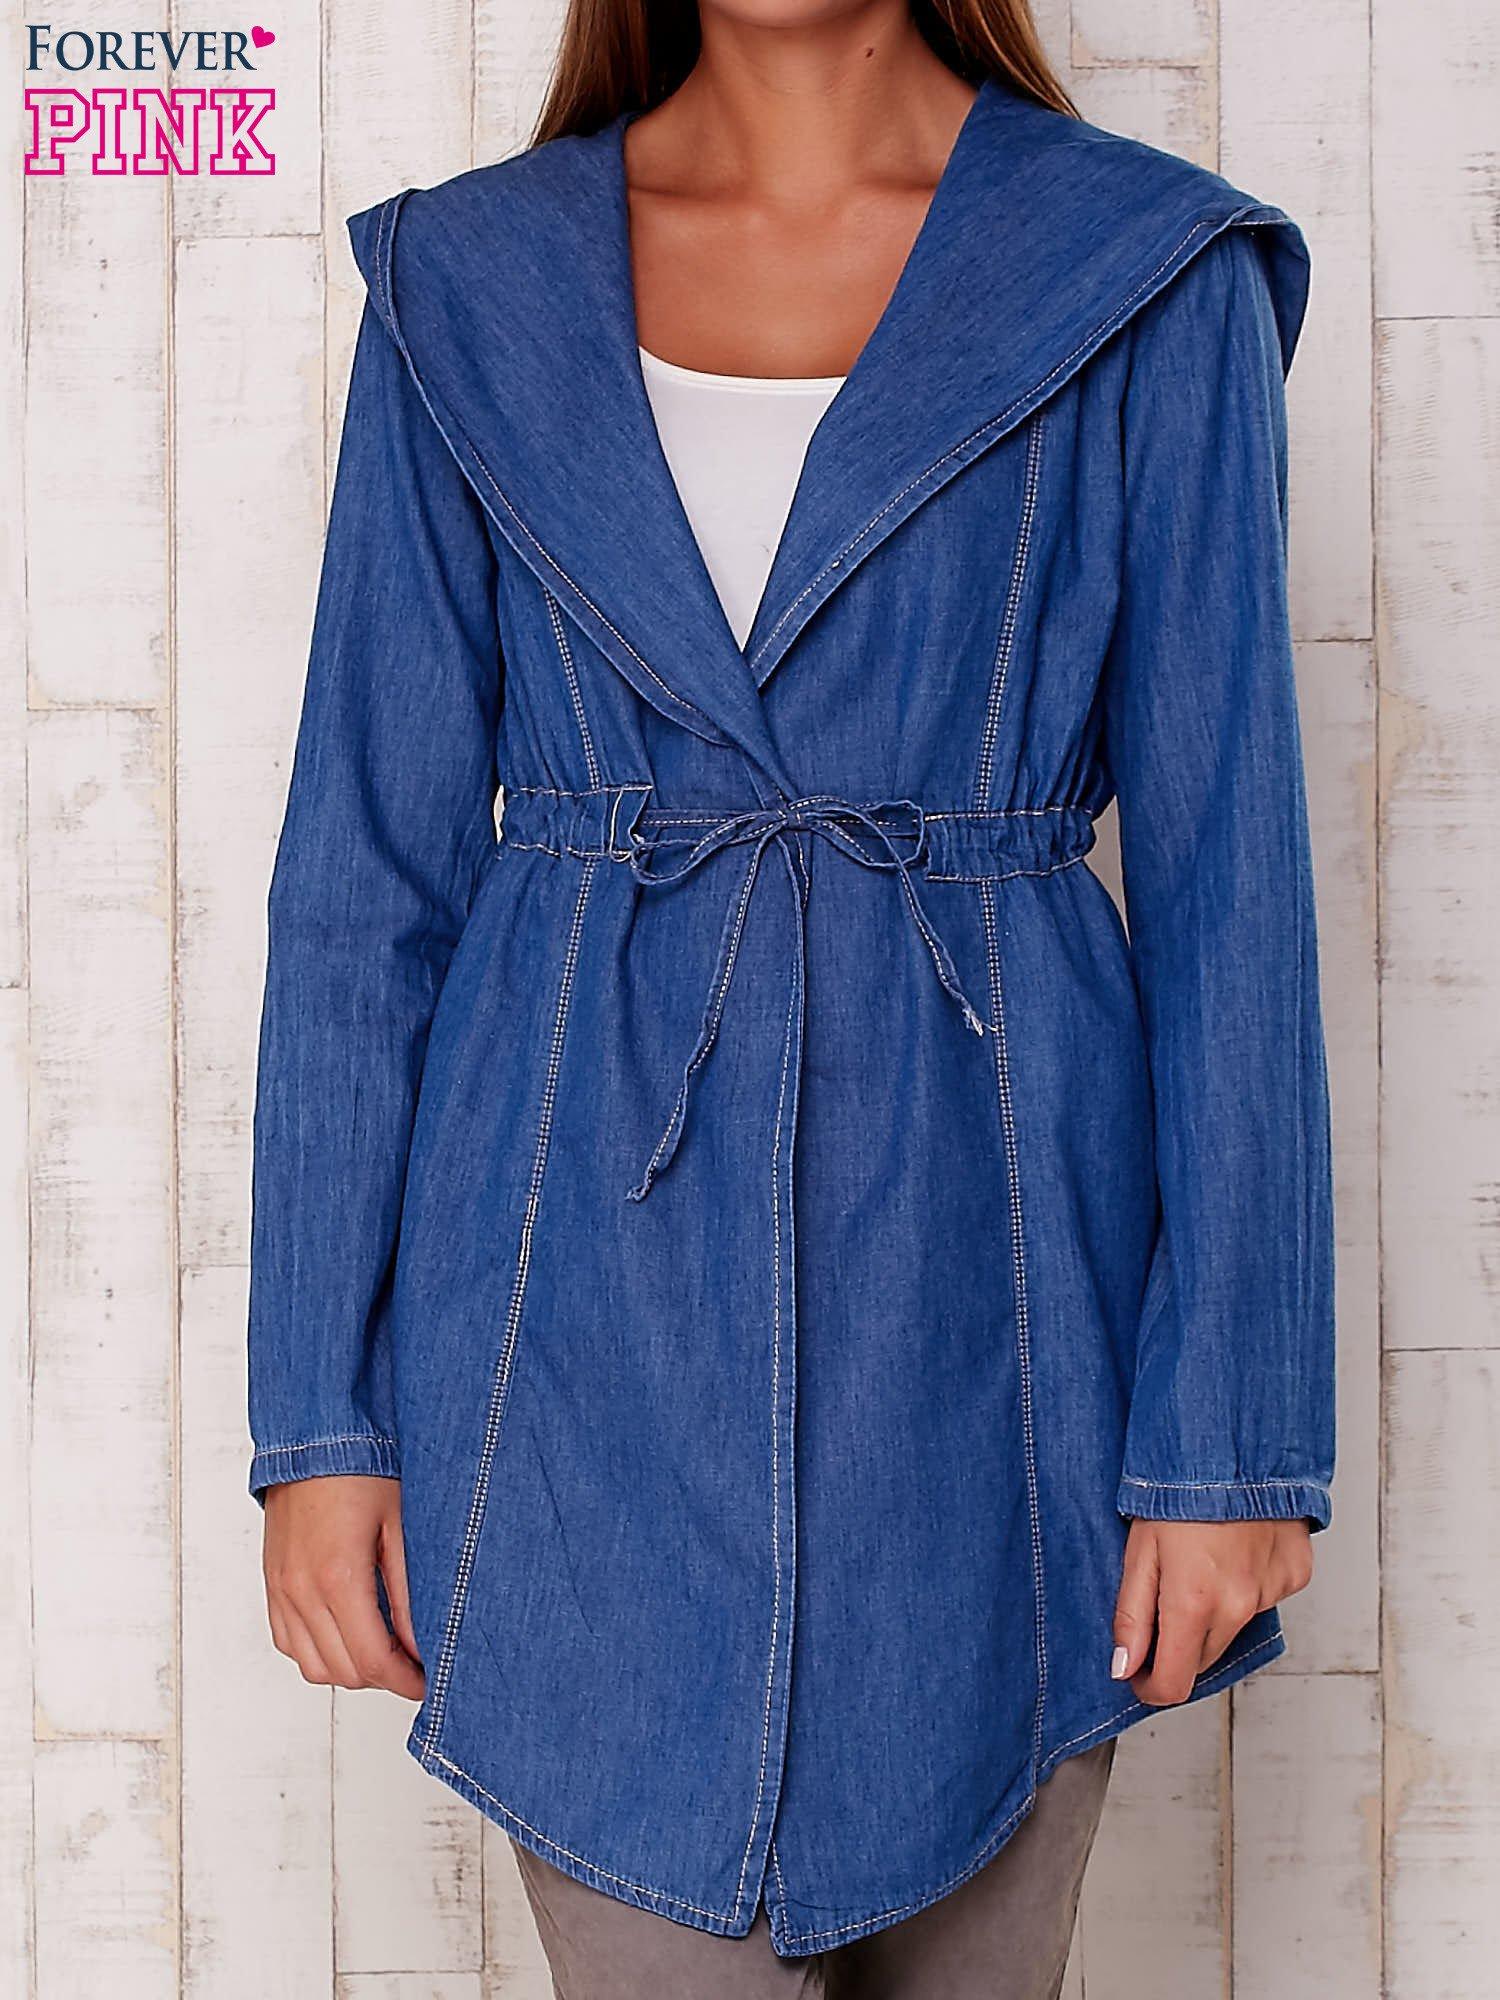 6250114fe6b6c Z Koszula Kapturem Jeansowa Narzutka Niebieska wHtAfA